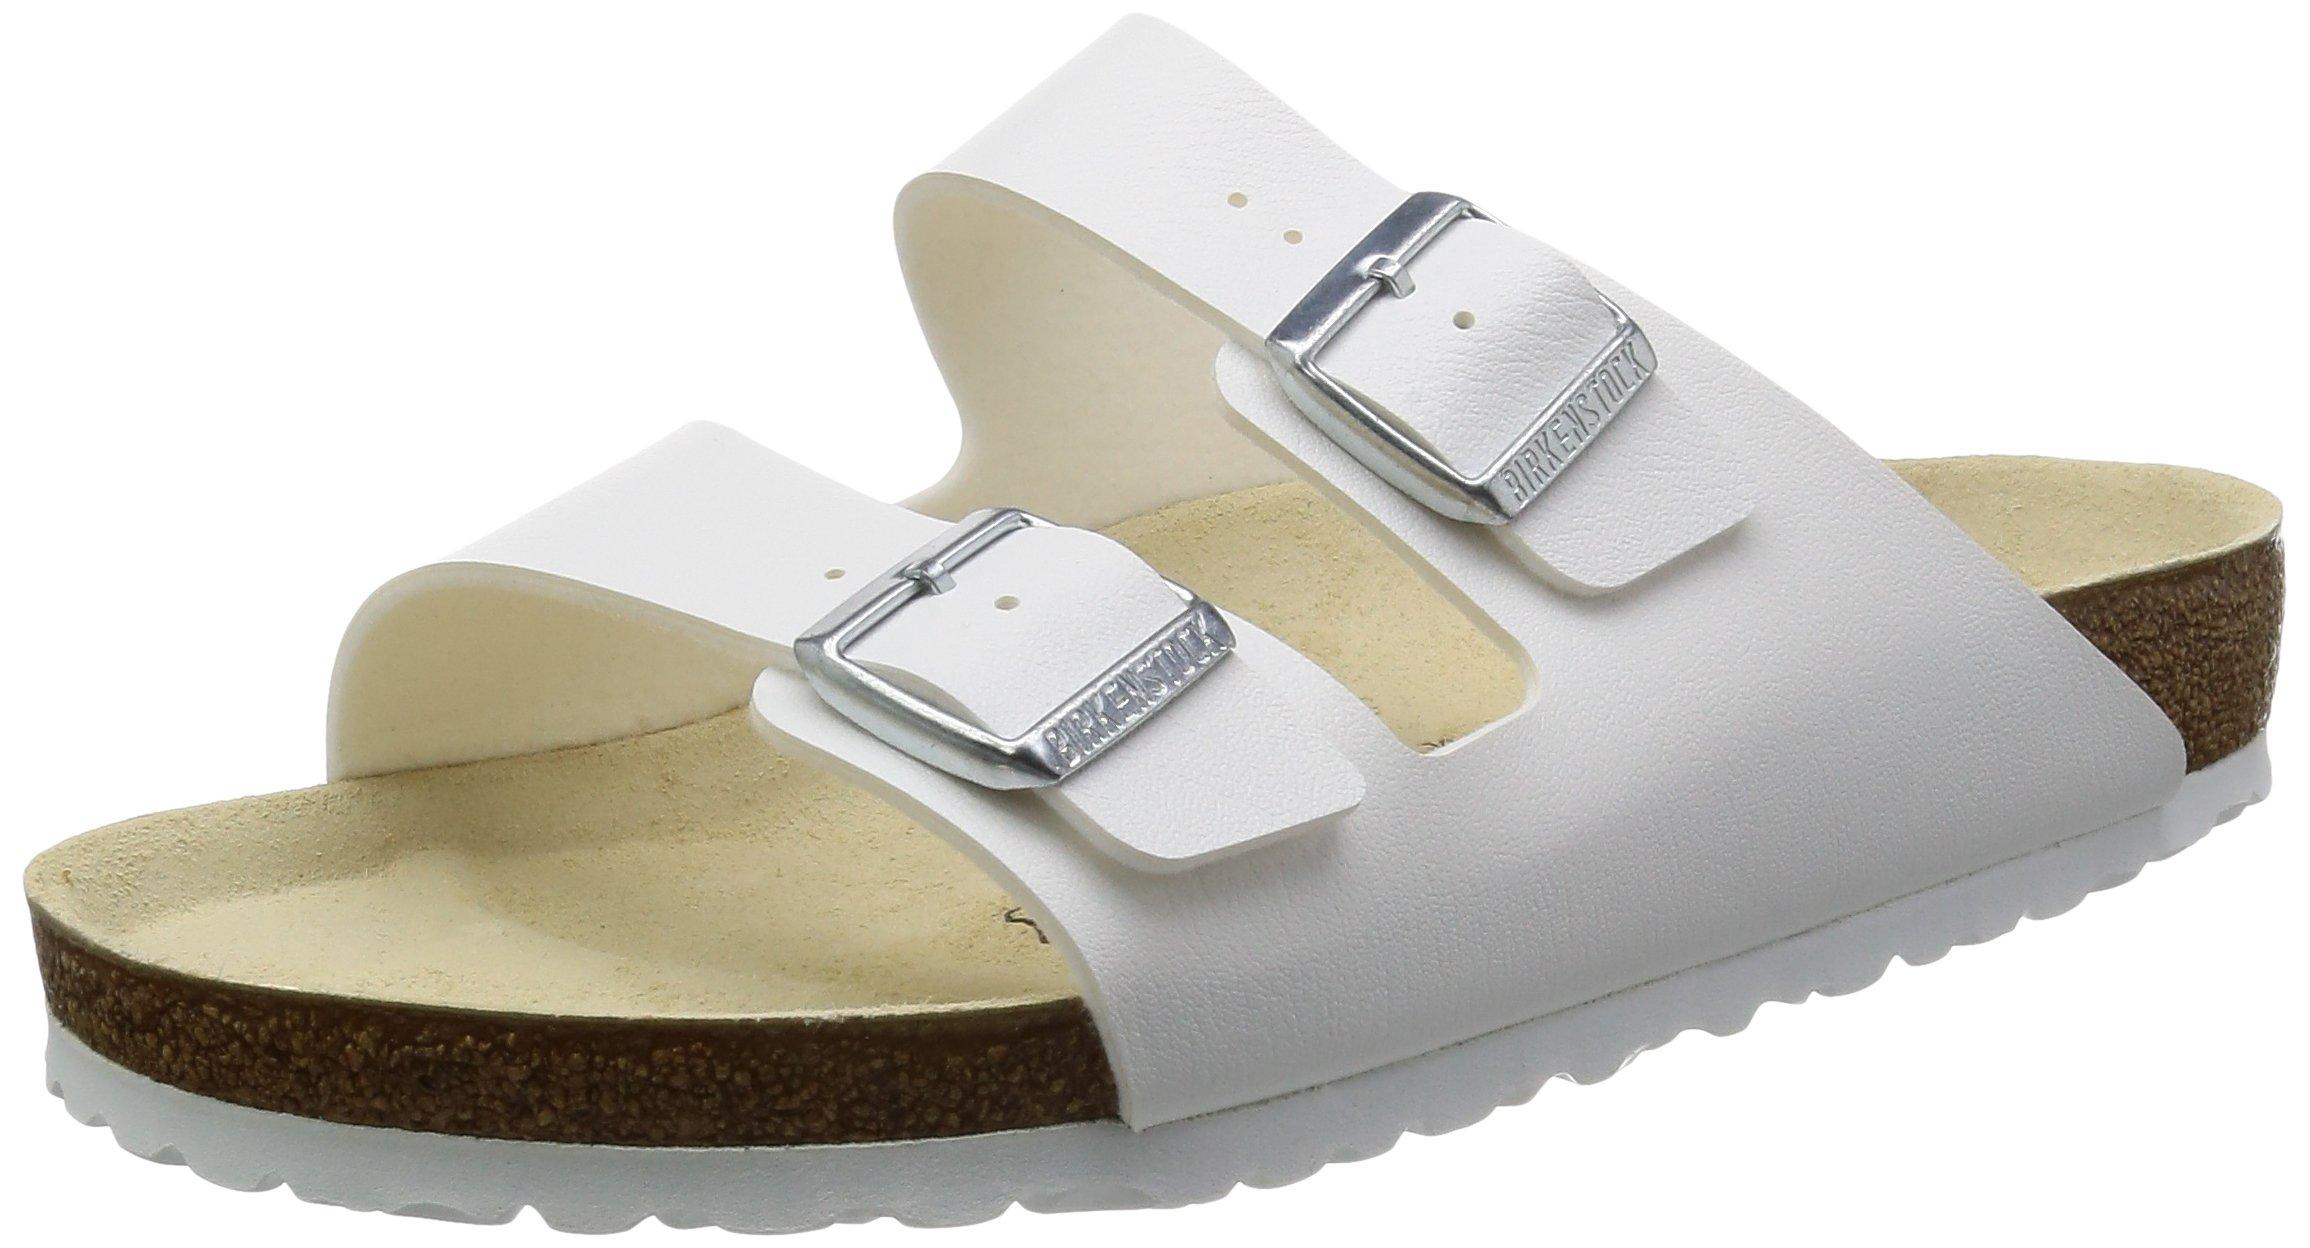 Birkenstock Arizona Sandals Birko Flor - EUR 40 - narrow - white